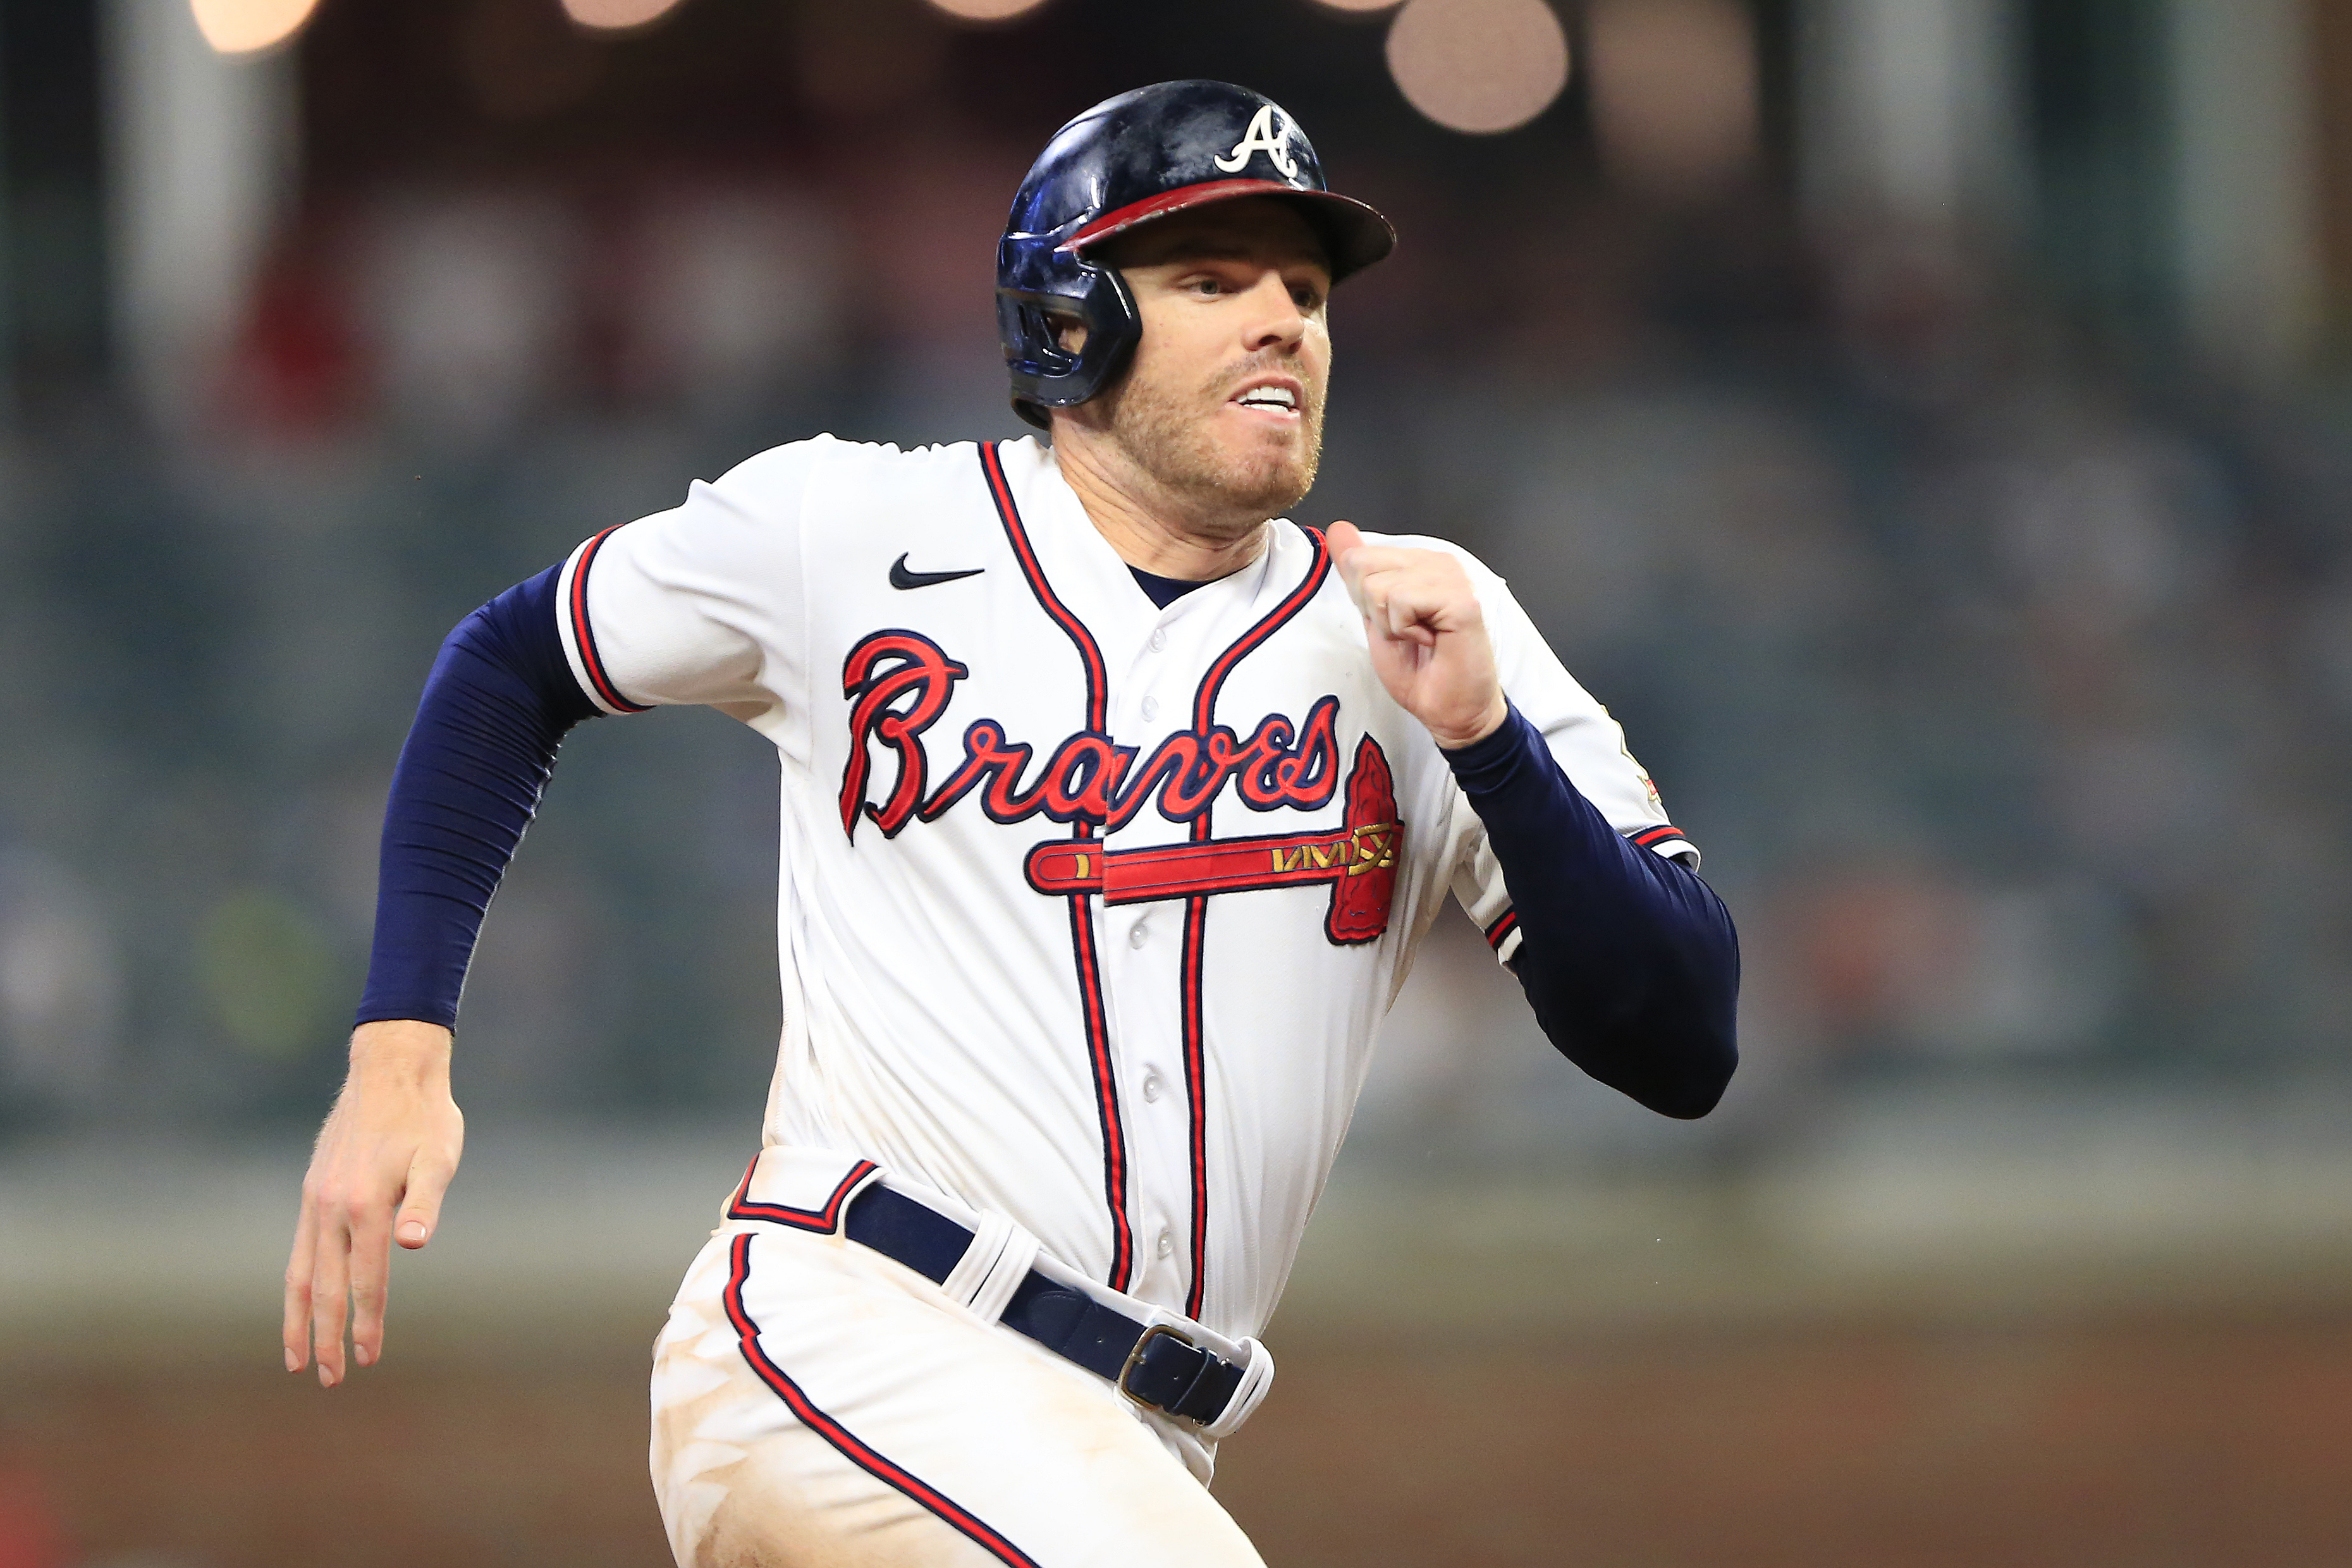 MLB: AUG 24 Yankees at Braves